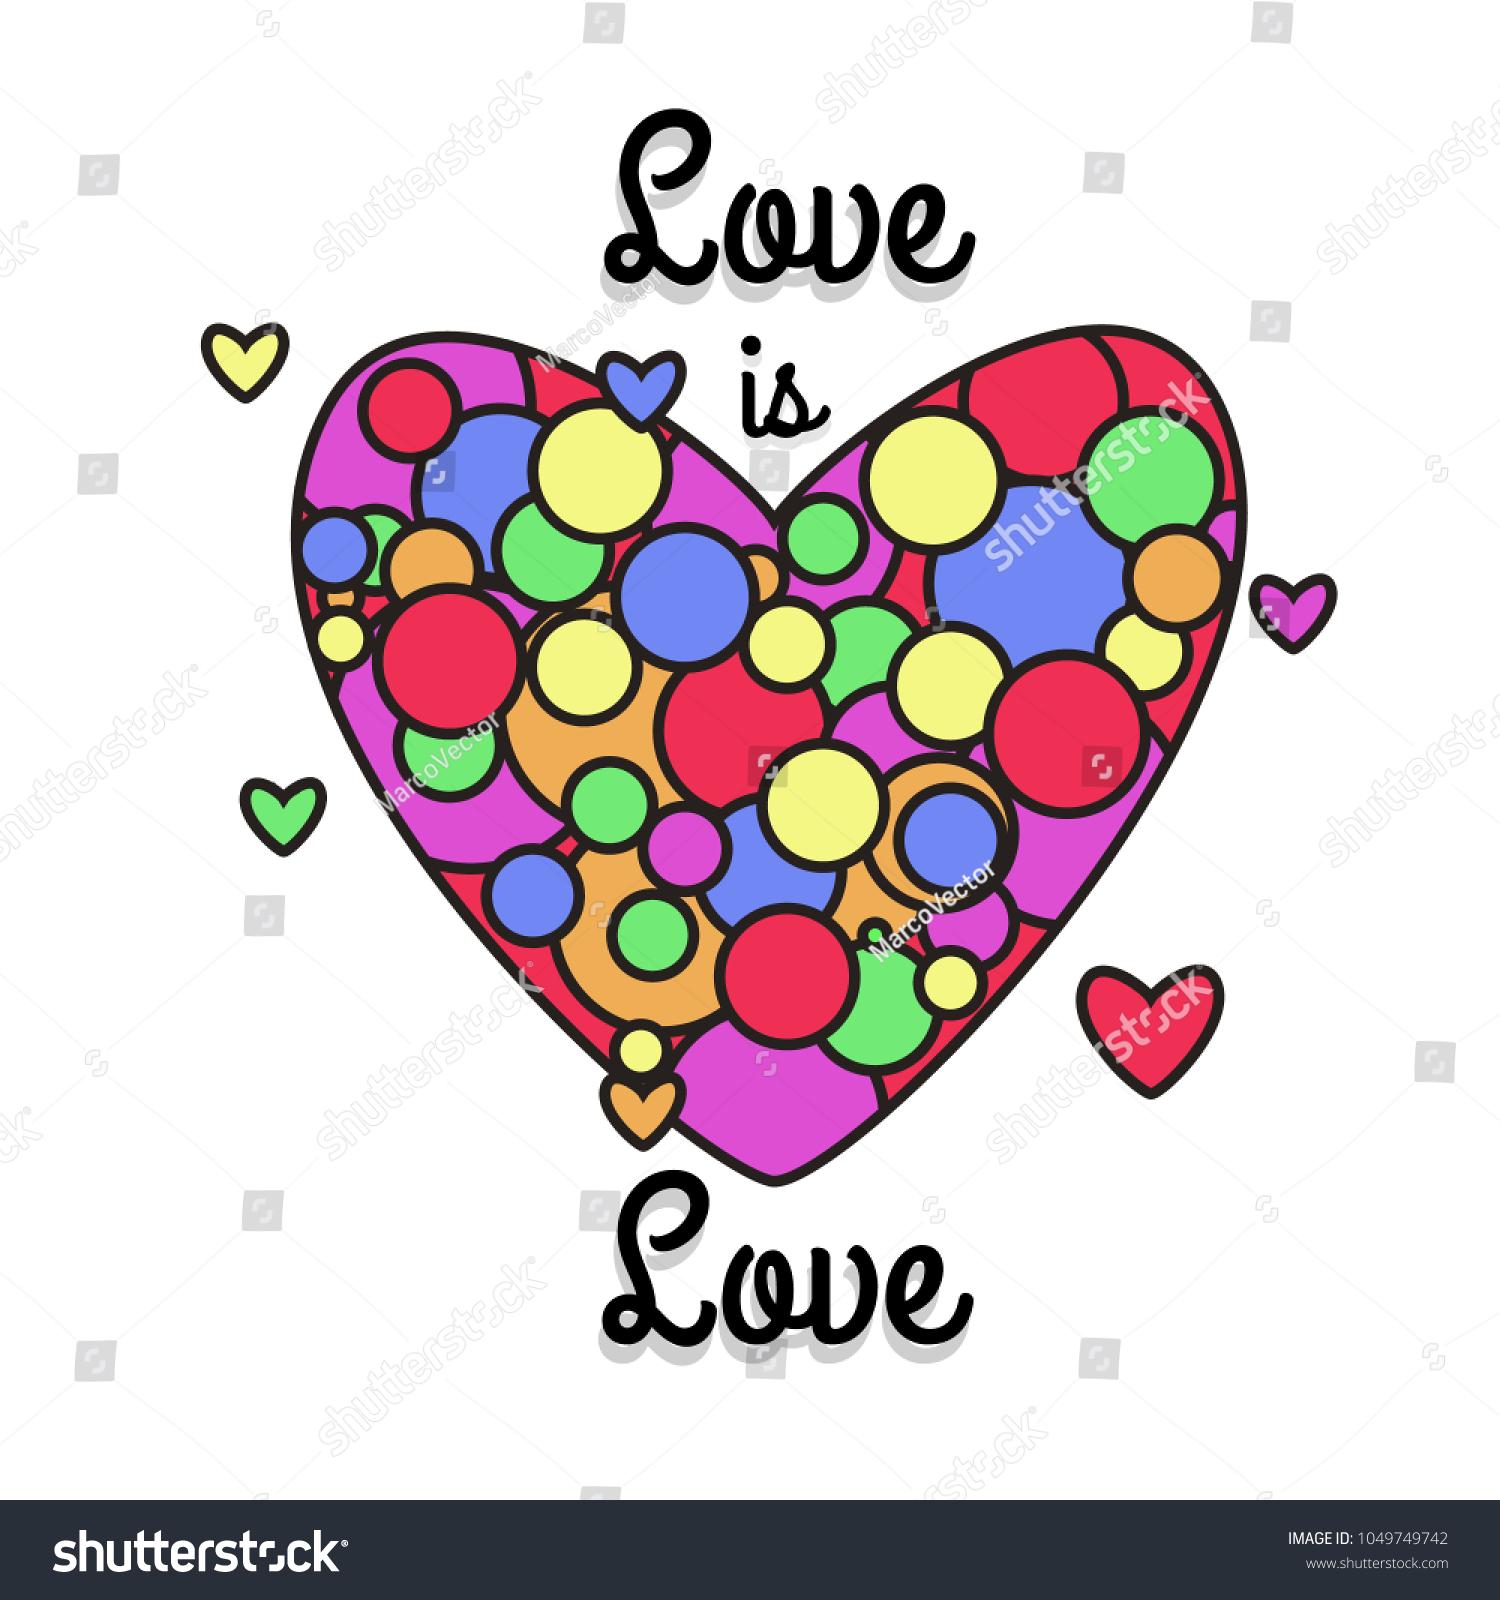 Lgbt rainbow heart symbol love modern stock vector 1049749742 lgbt rainbow heart symbol of love modern style flat vector illustration icons isolated on buycottarizona Images